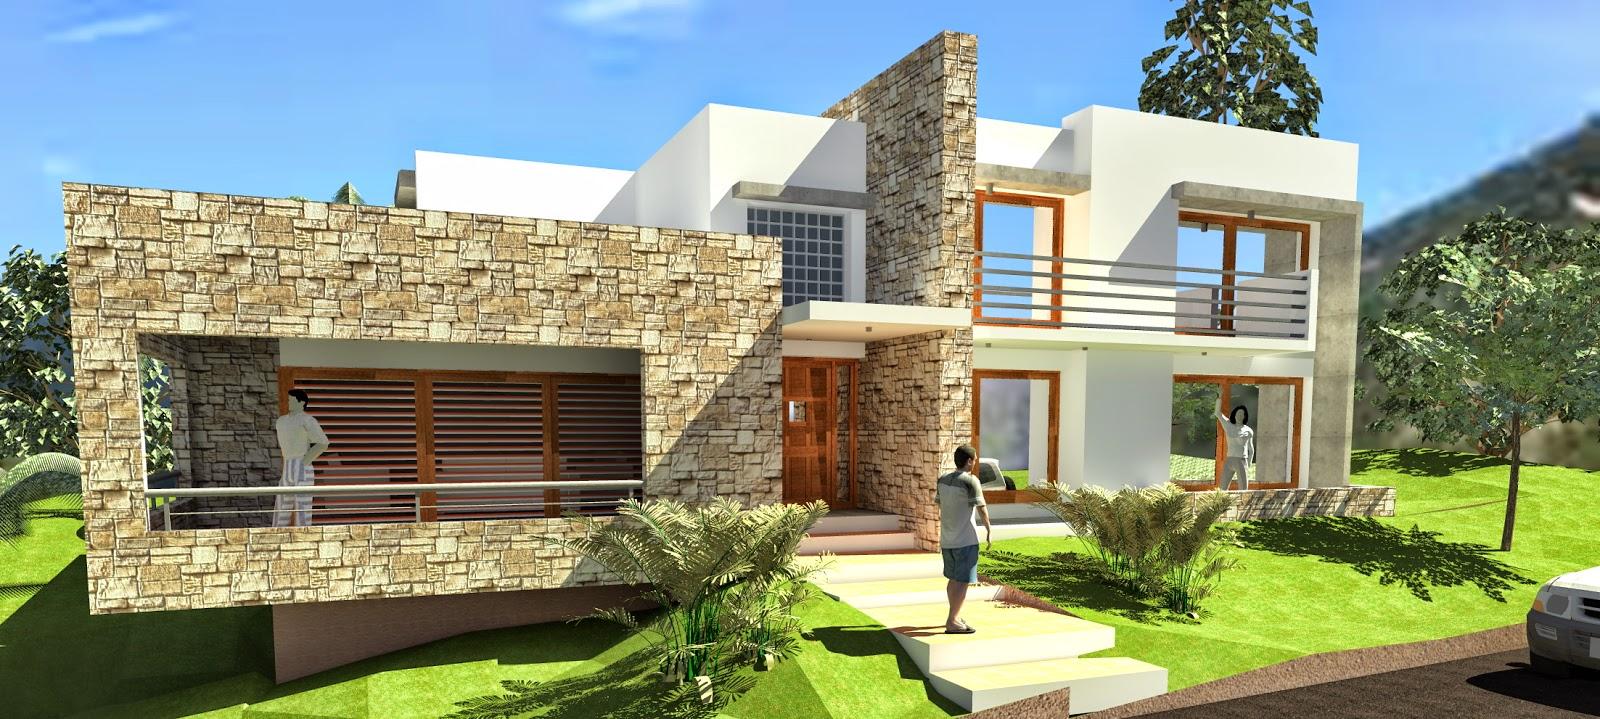 Casa en barrio jardin arquitecto roque e paulino - Casa con terreno ...